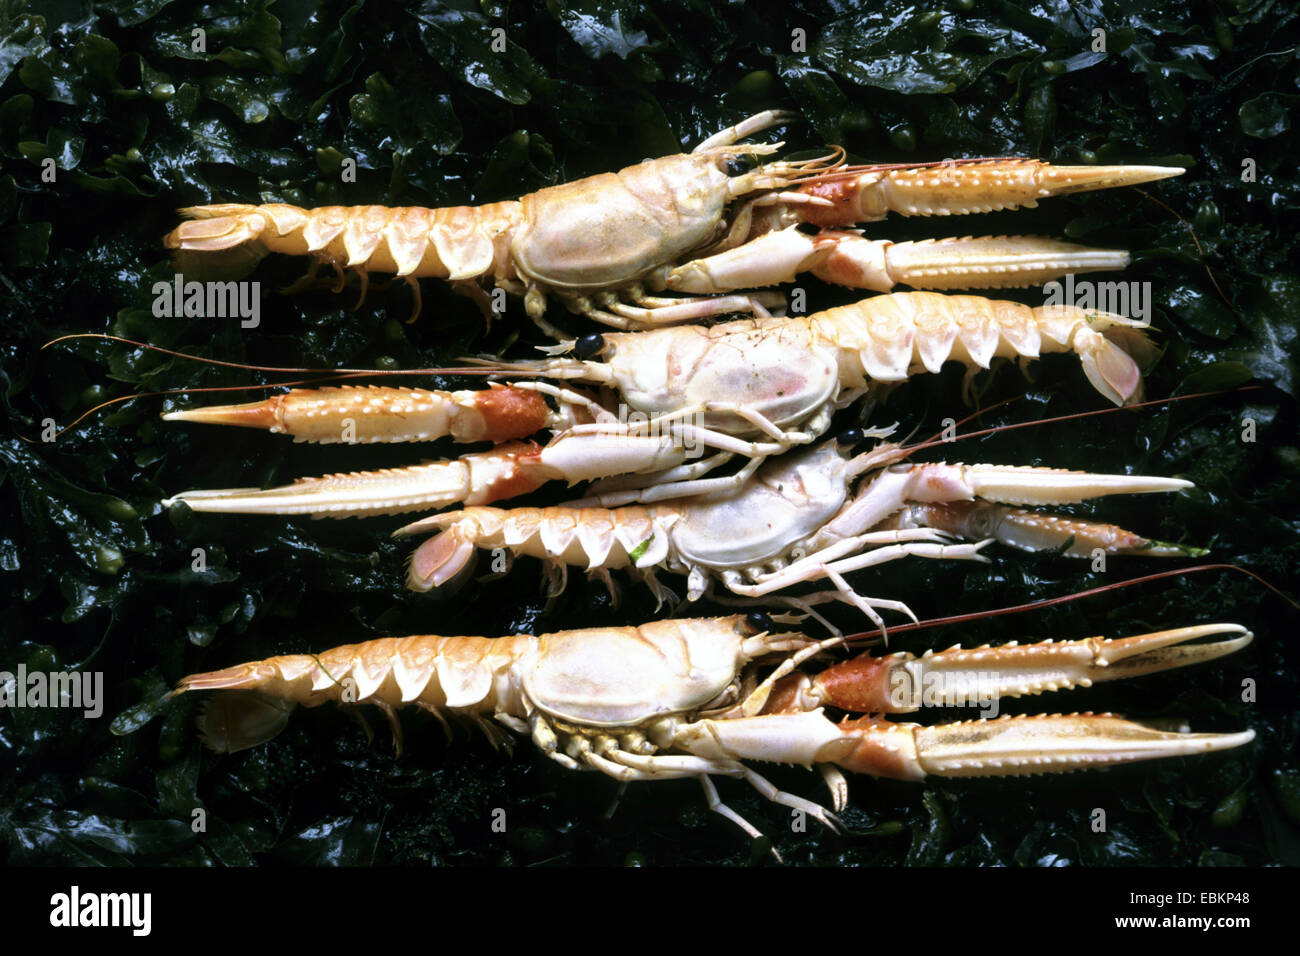 Norway lobster, Norway clawed lobster, Dublin Bay lobster, Dublin Bay prawn (scampi, langoustine) (Nephrops norvegicus), - Stock Image